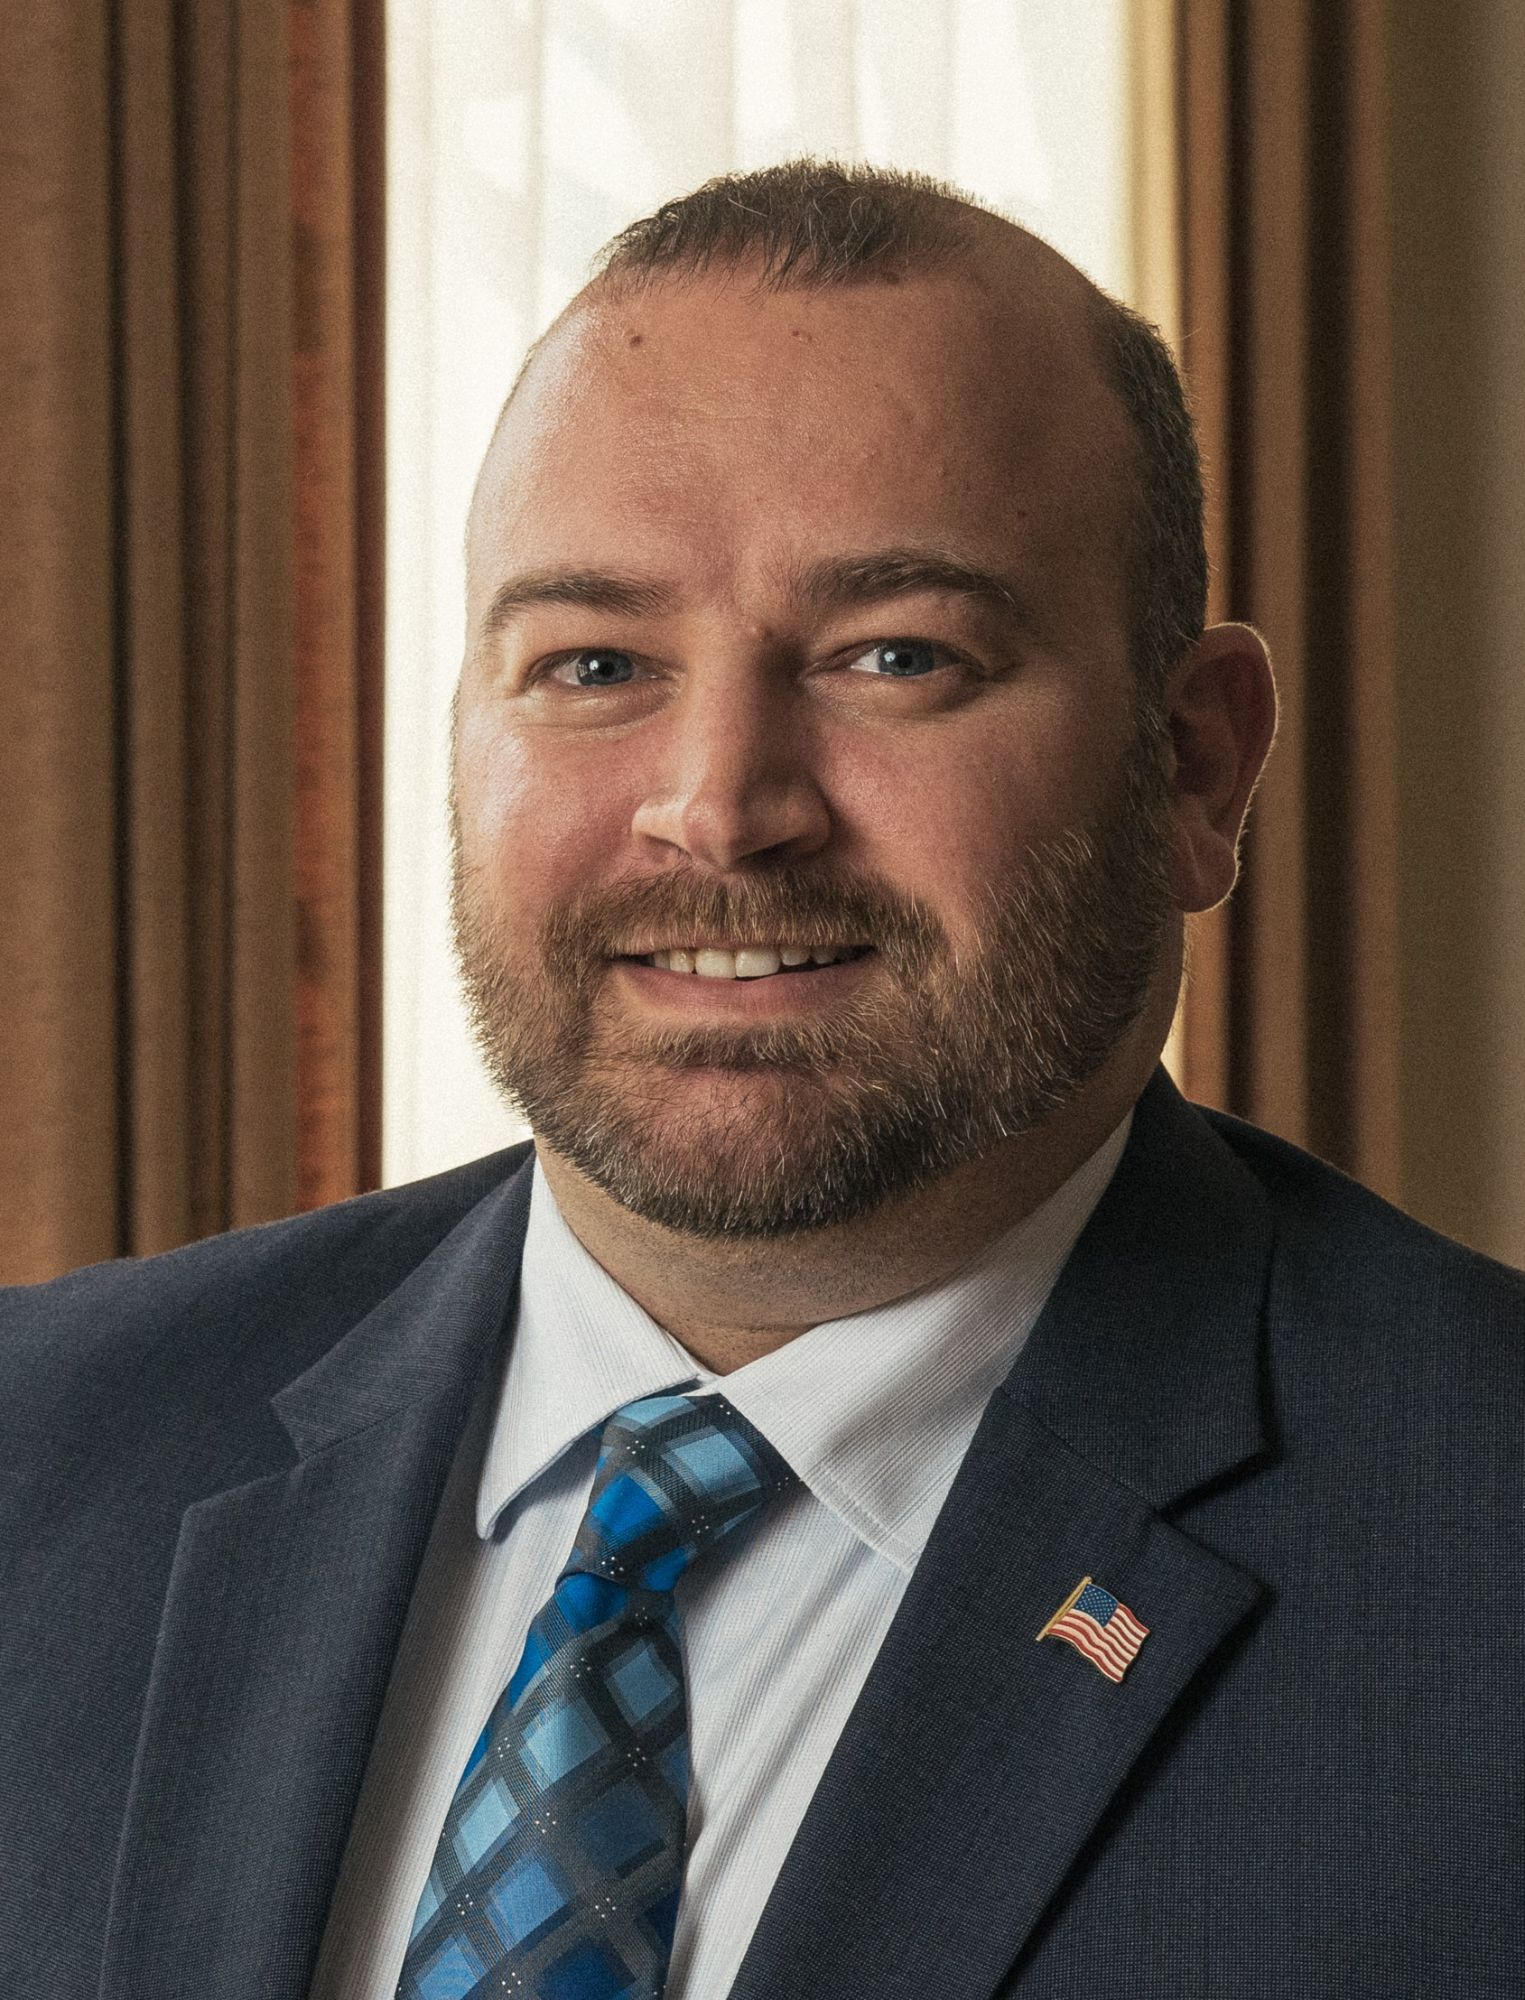 Photo of Garrett Lee Anderson - Owner/Supervisor/Funeral Director